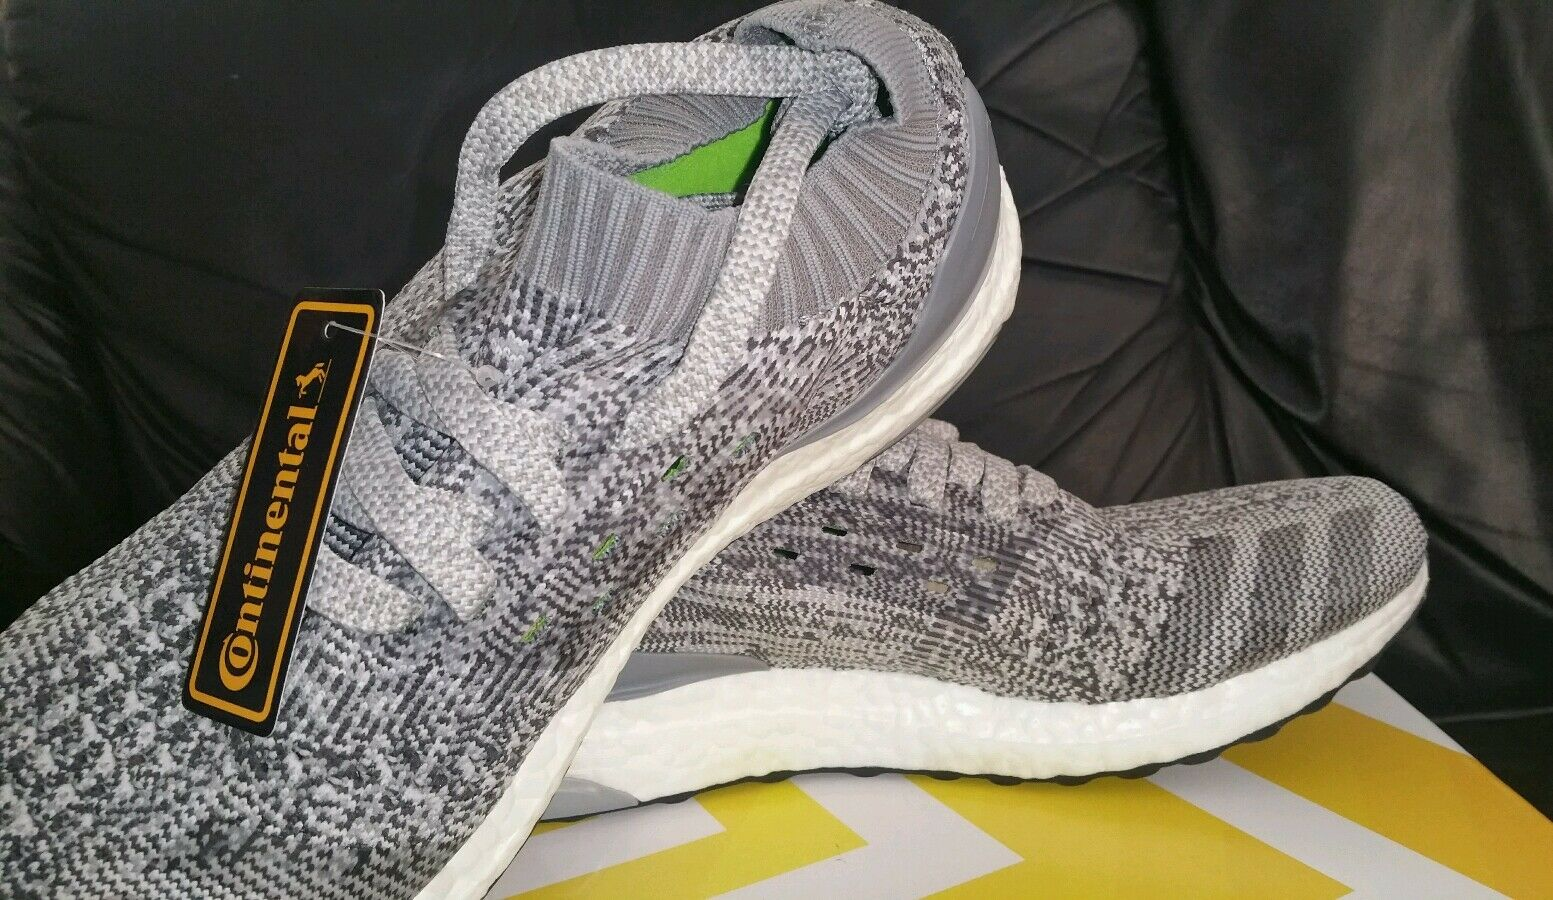 check out f5b30 d47d9 ... Adidas Adidas Adidas ultra impulso senza freni grey primeknit nmd pk  bb3898 8 f6ae94 ...